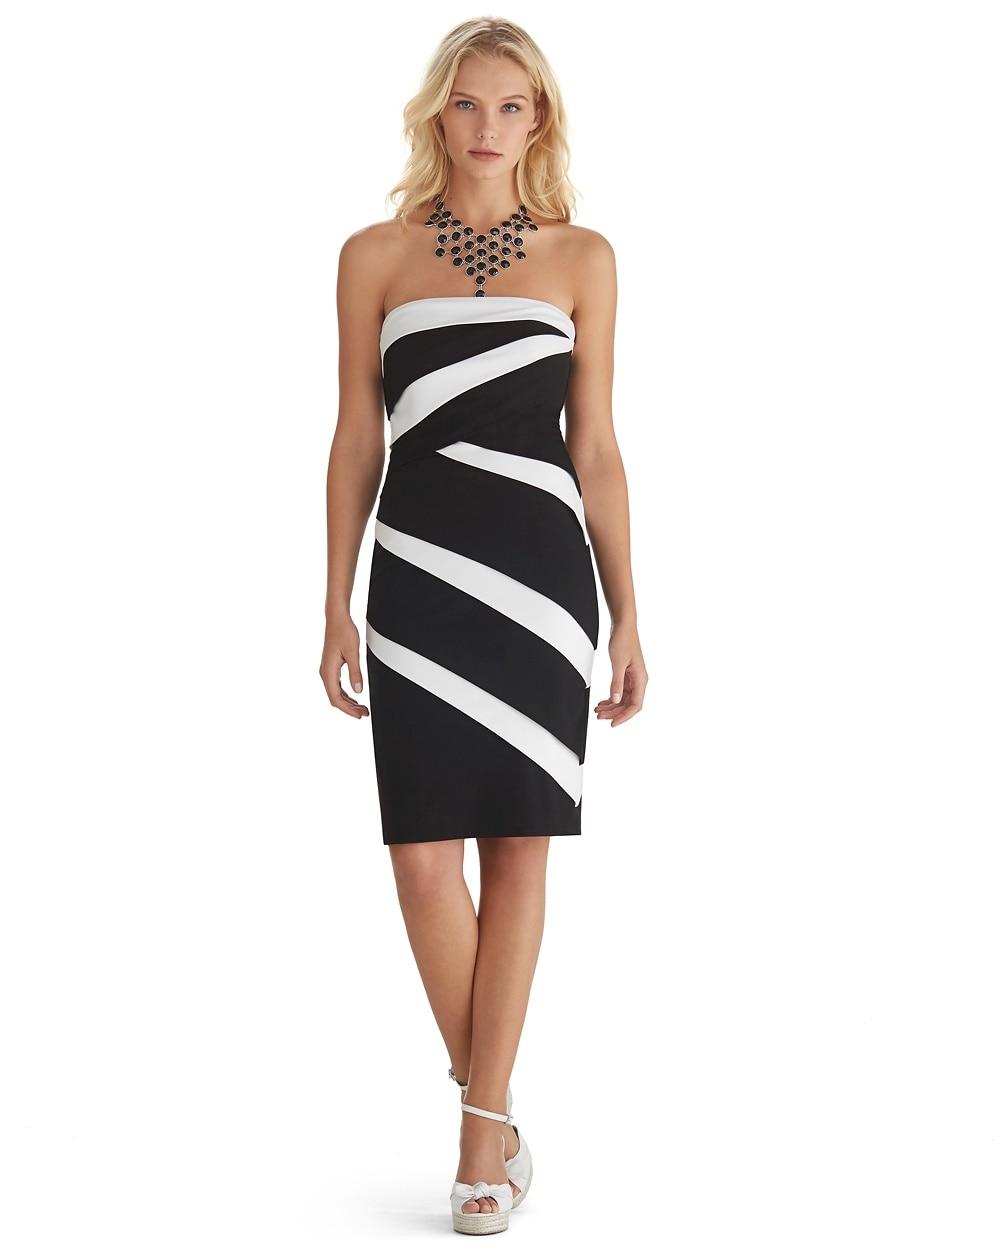 Color Block Strapless Instantly Slimming Dress White House Black